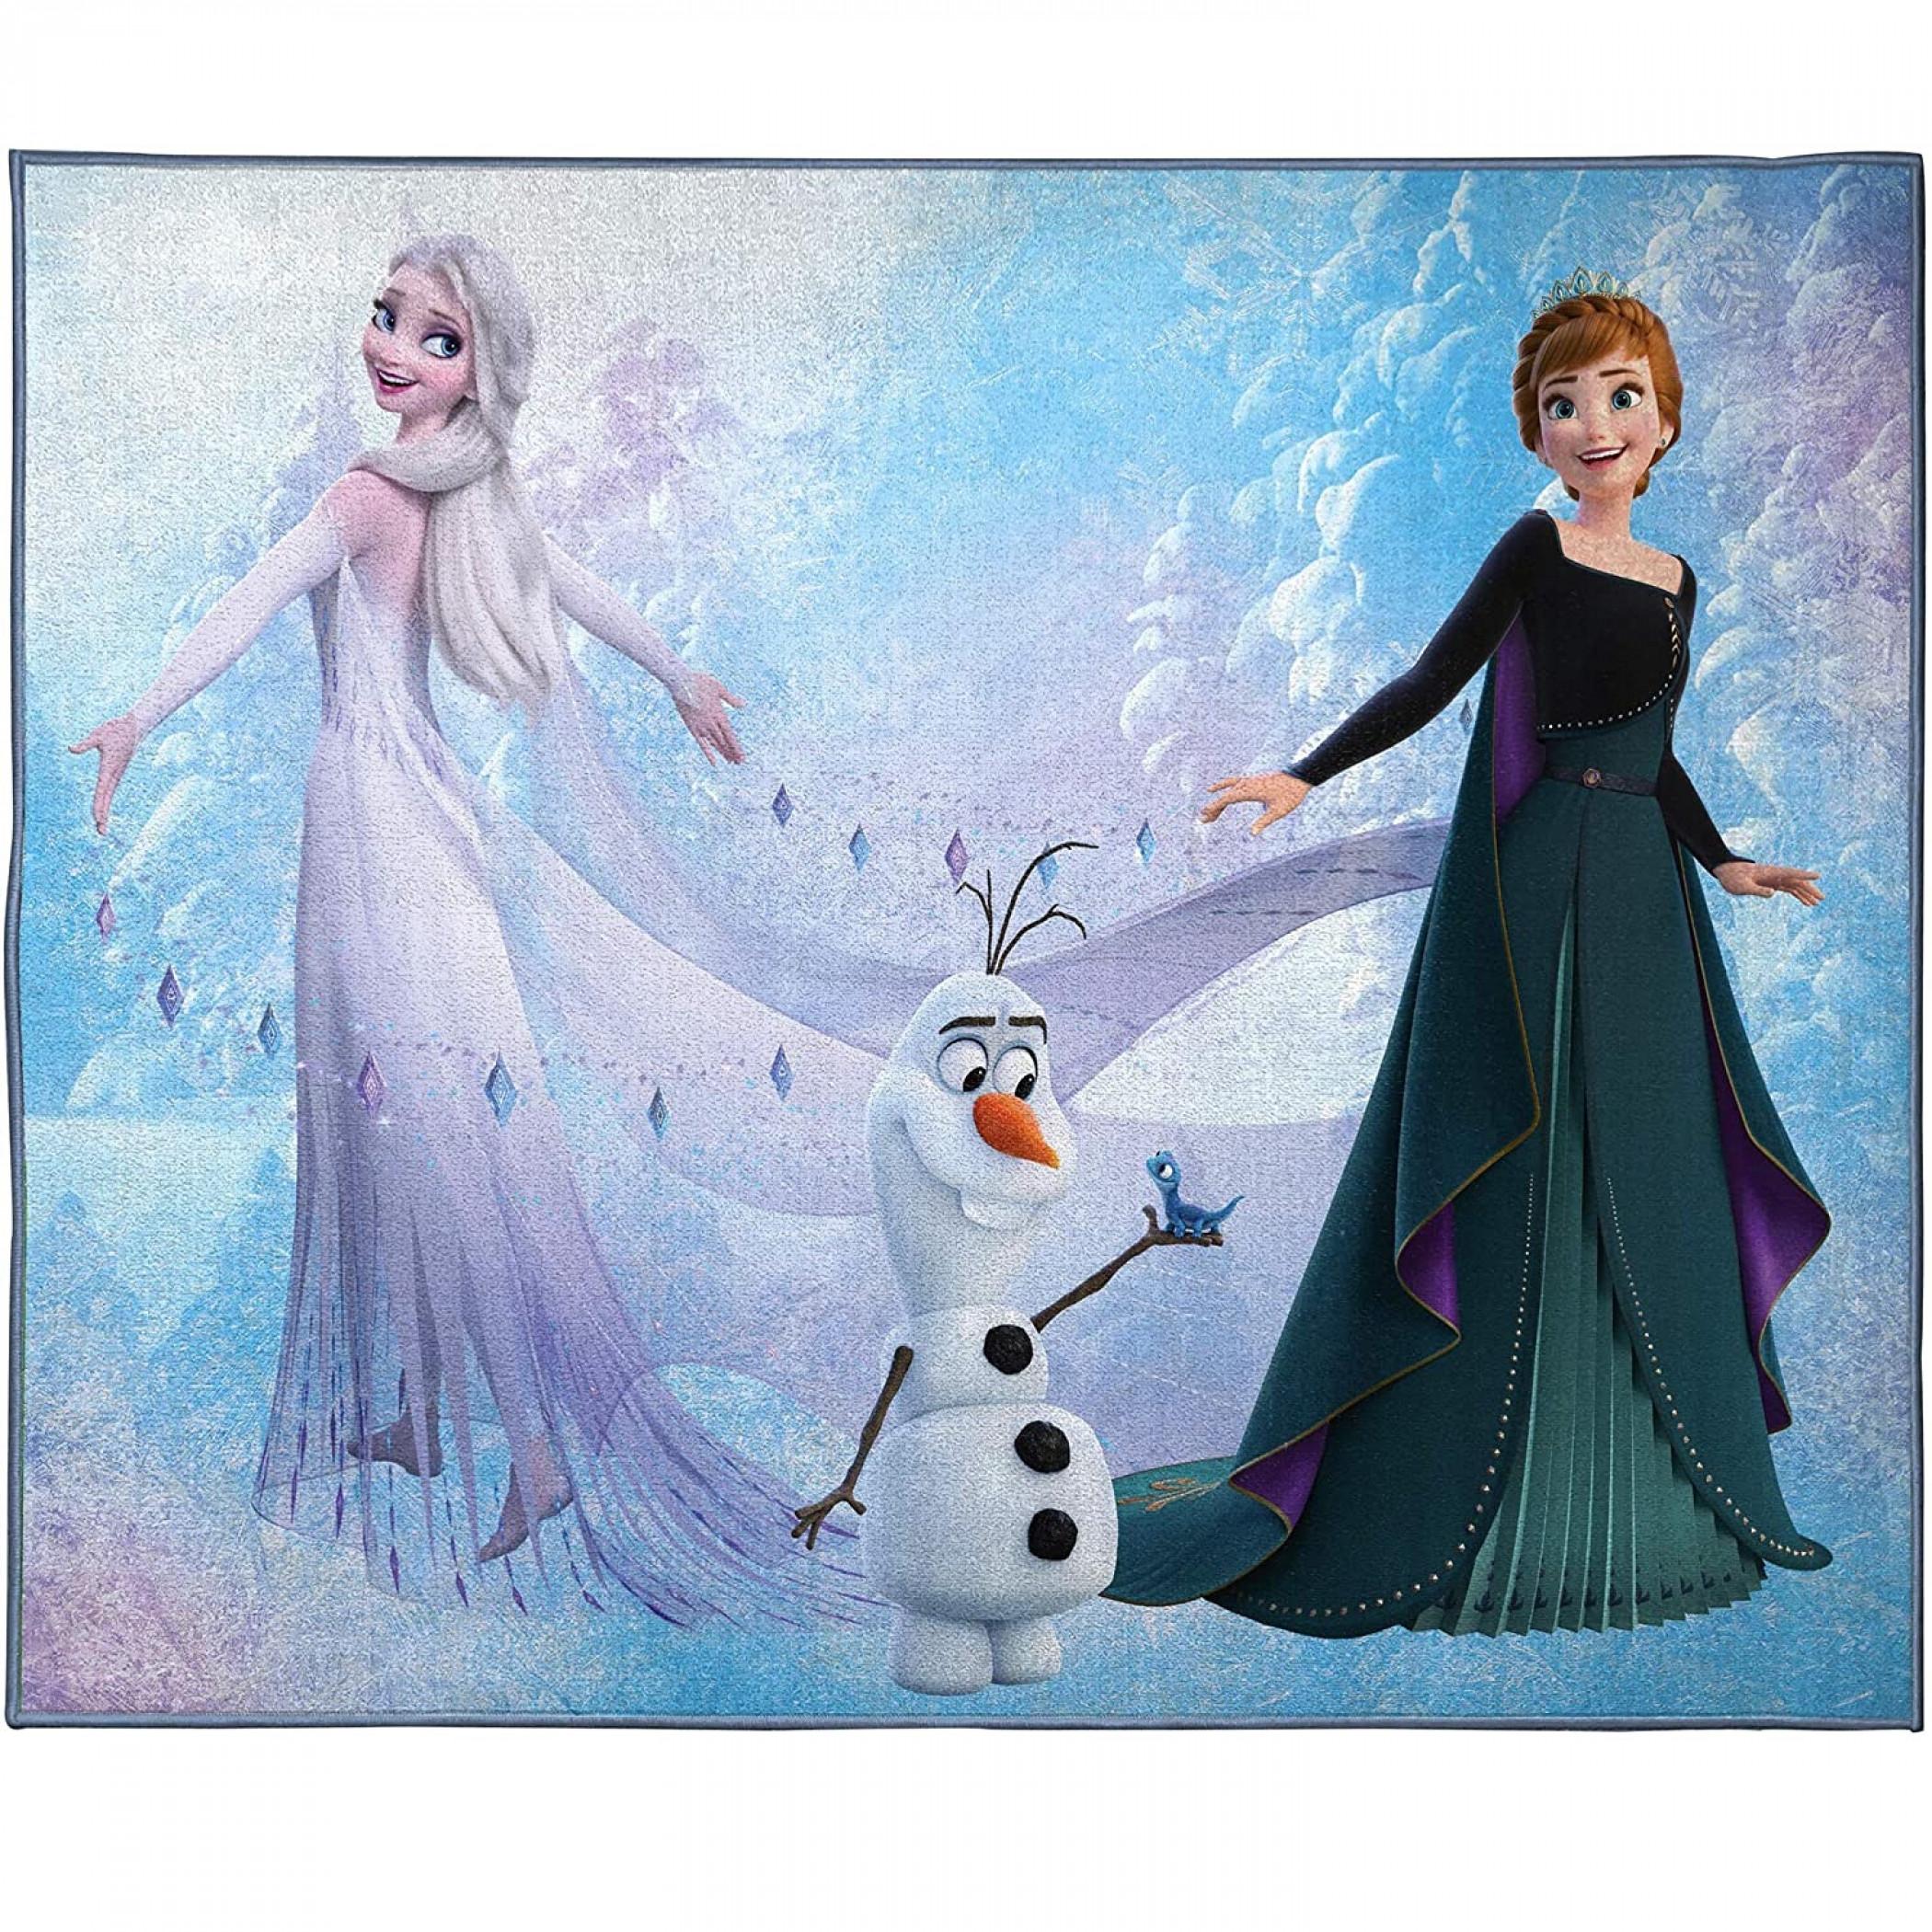 Disney Frozen 2 Snow and Ice Room Rug